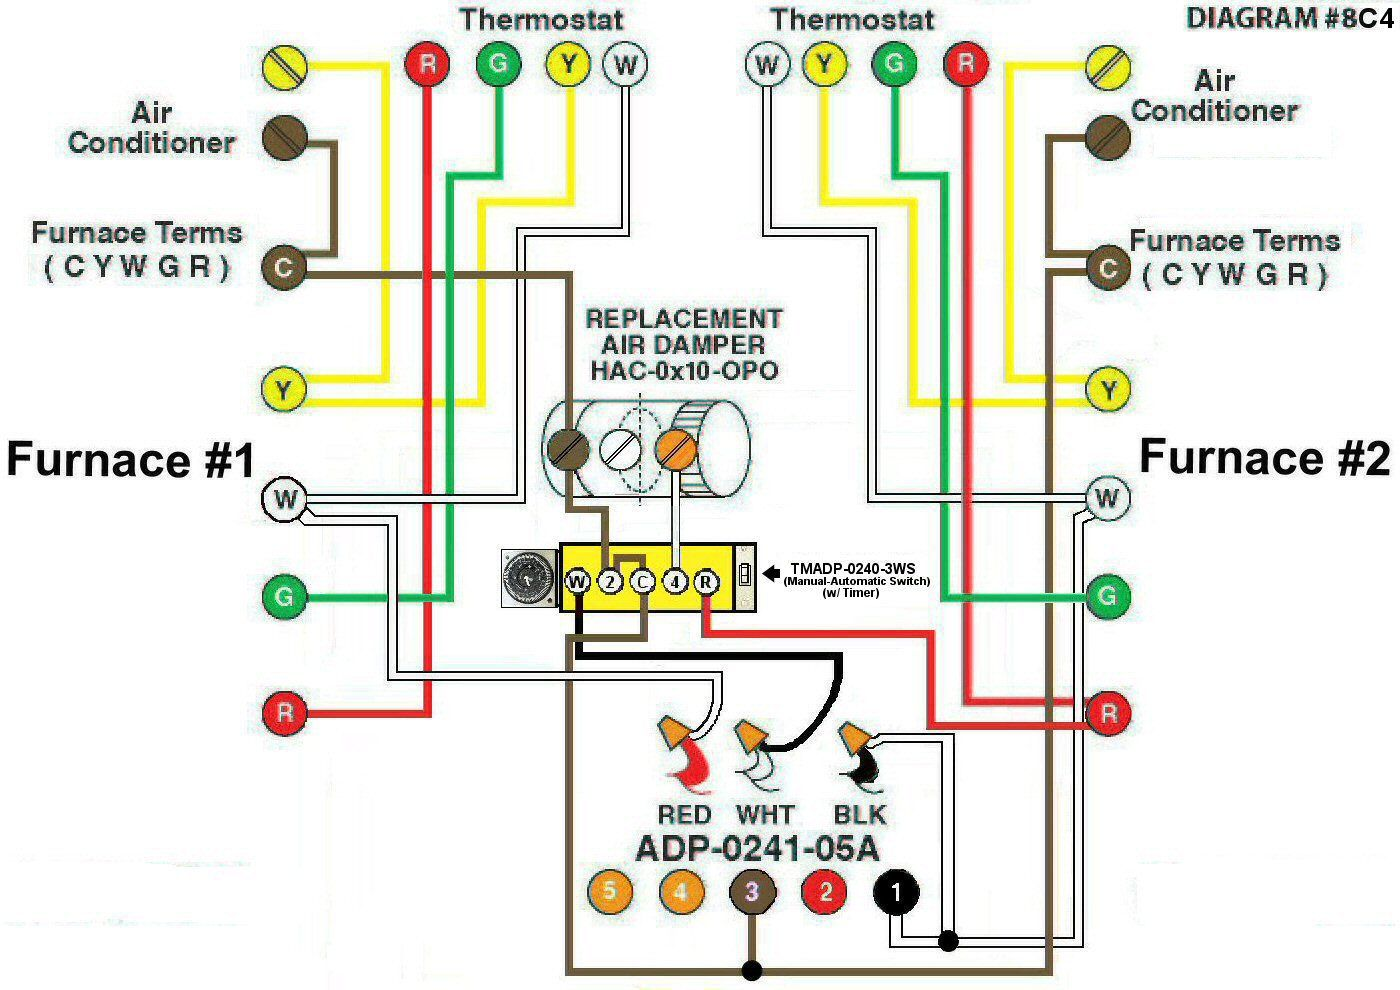 furnace blower wiring diagram me new heat pinterest wire and basic hvac blower wiring [ 1400 x 990 Pixel ]